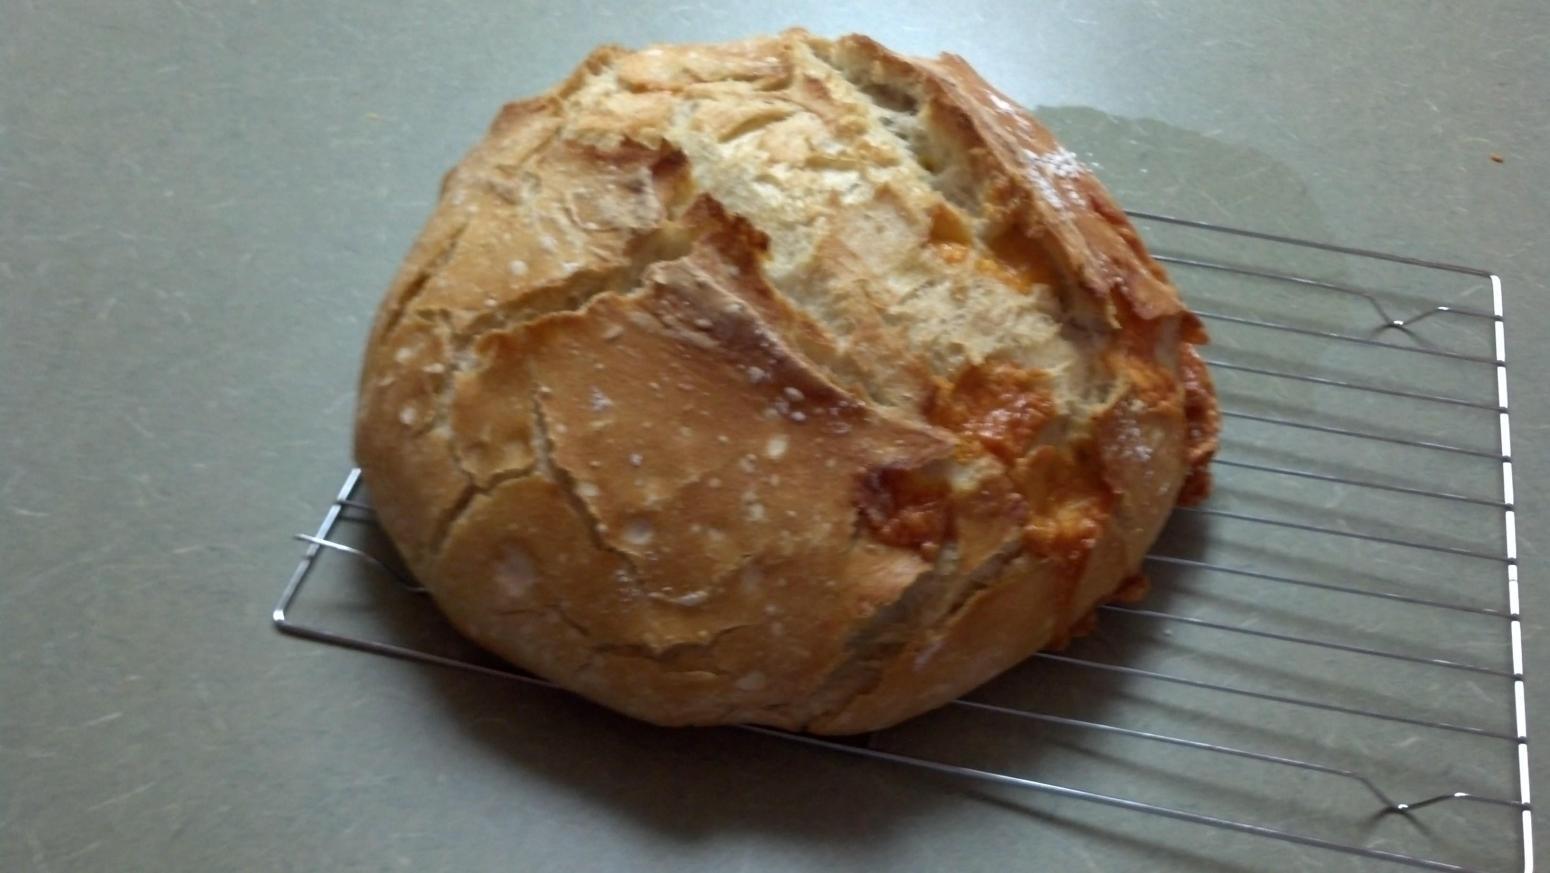 Crusty Homemade Bread Artisan Type Recipe